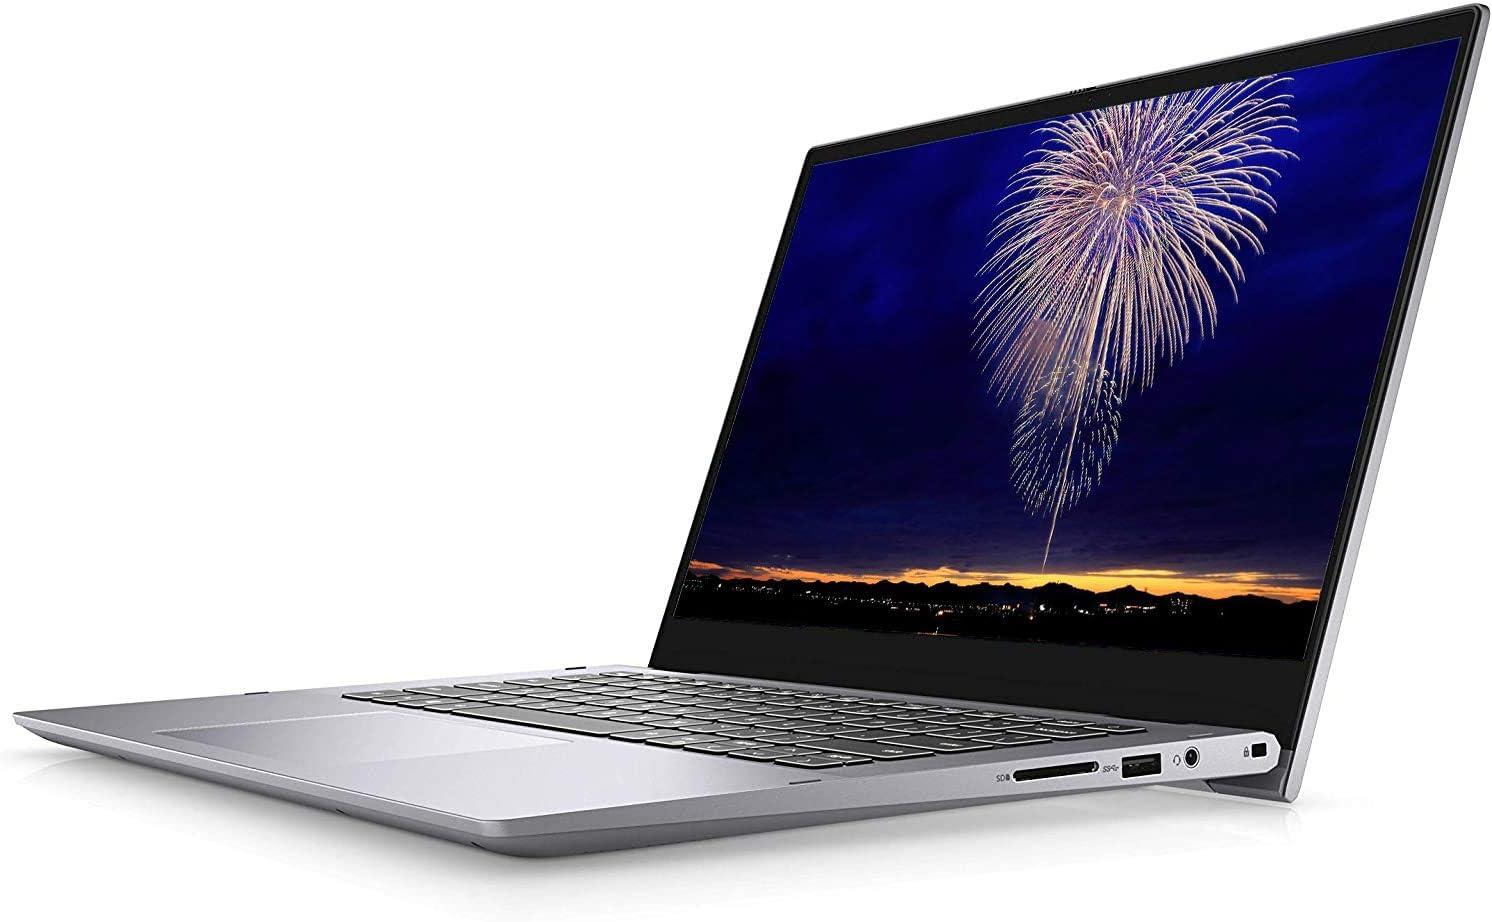 "2021 Dell Inspiron 14 5000 2-in-1 Business Laptop Computer, 14"" FHD Touchscreen, 11th Gen Intel 4-Core i7-1165G7, 16GB DDR4 RAM, 512GB NVMe SSD,Webcam,USB-C,HDMI | Windows 10 Pro"